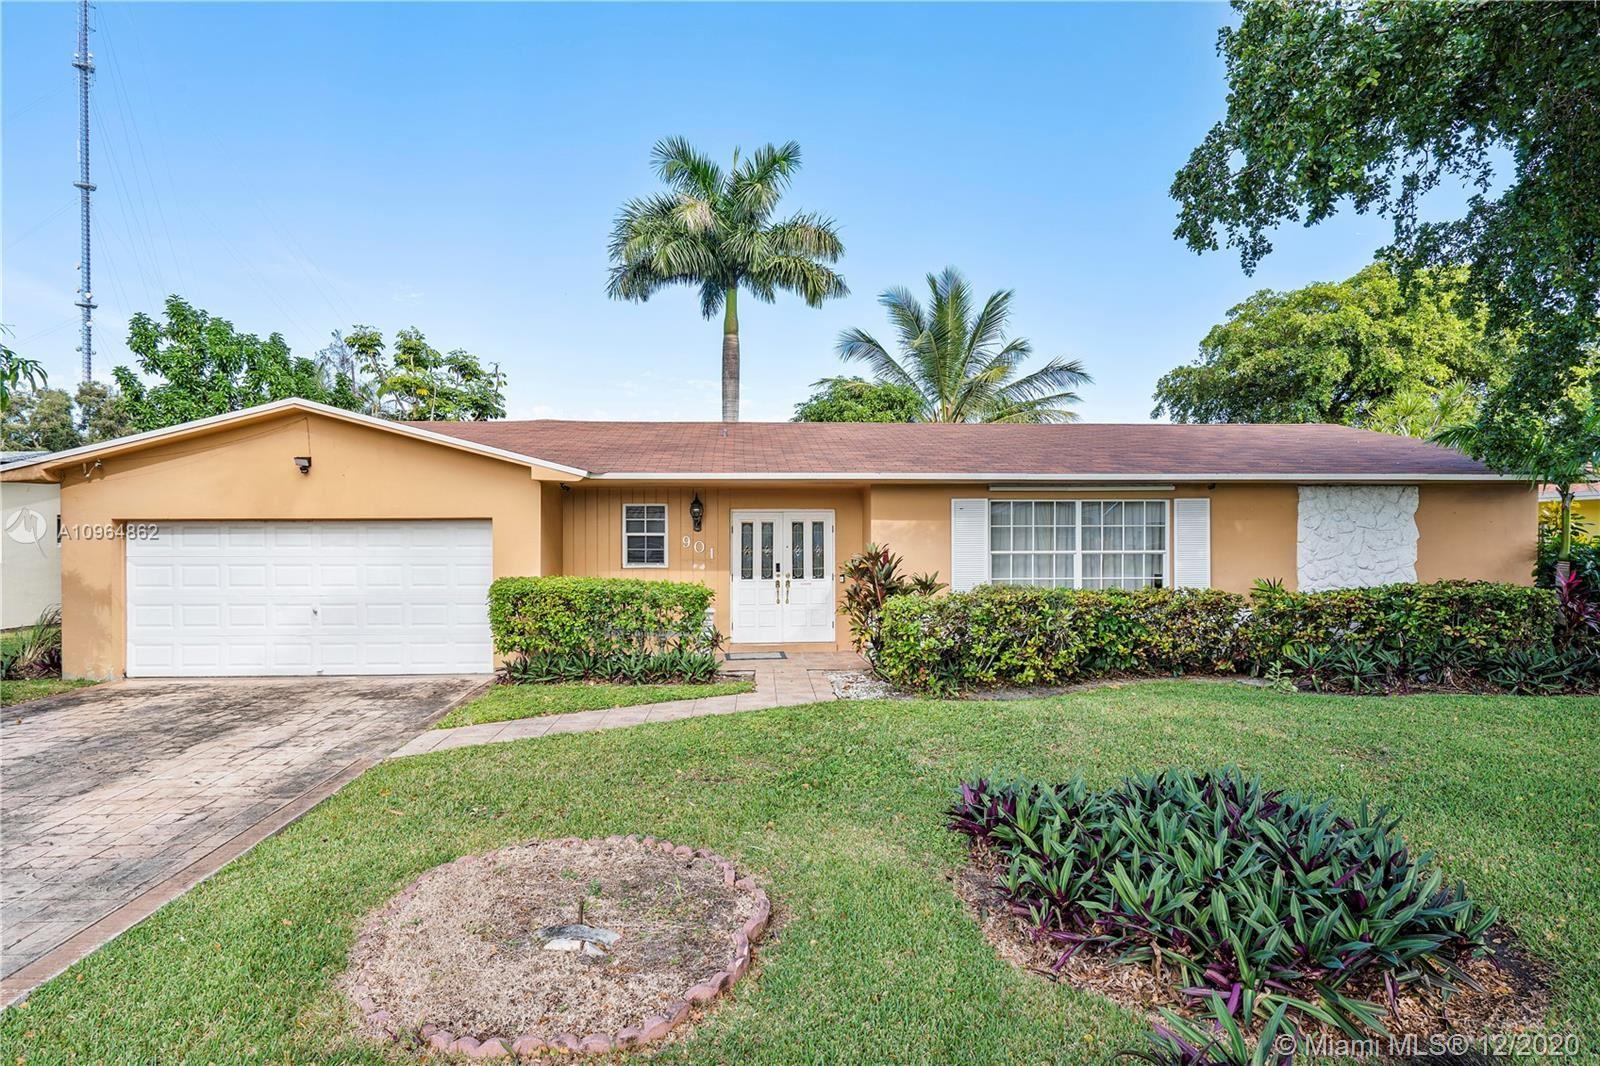 901 NW 207th St, Miami Gardens, FL 33169 - #: A10964862